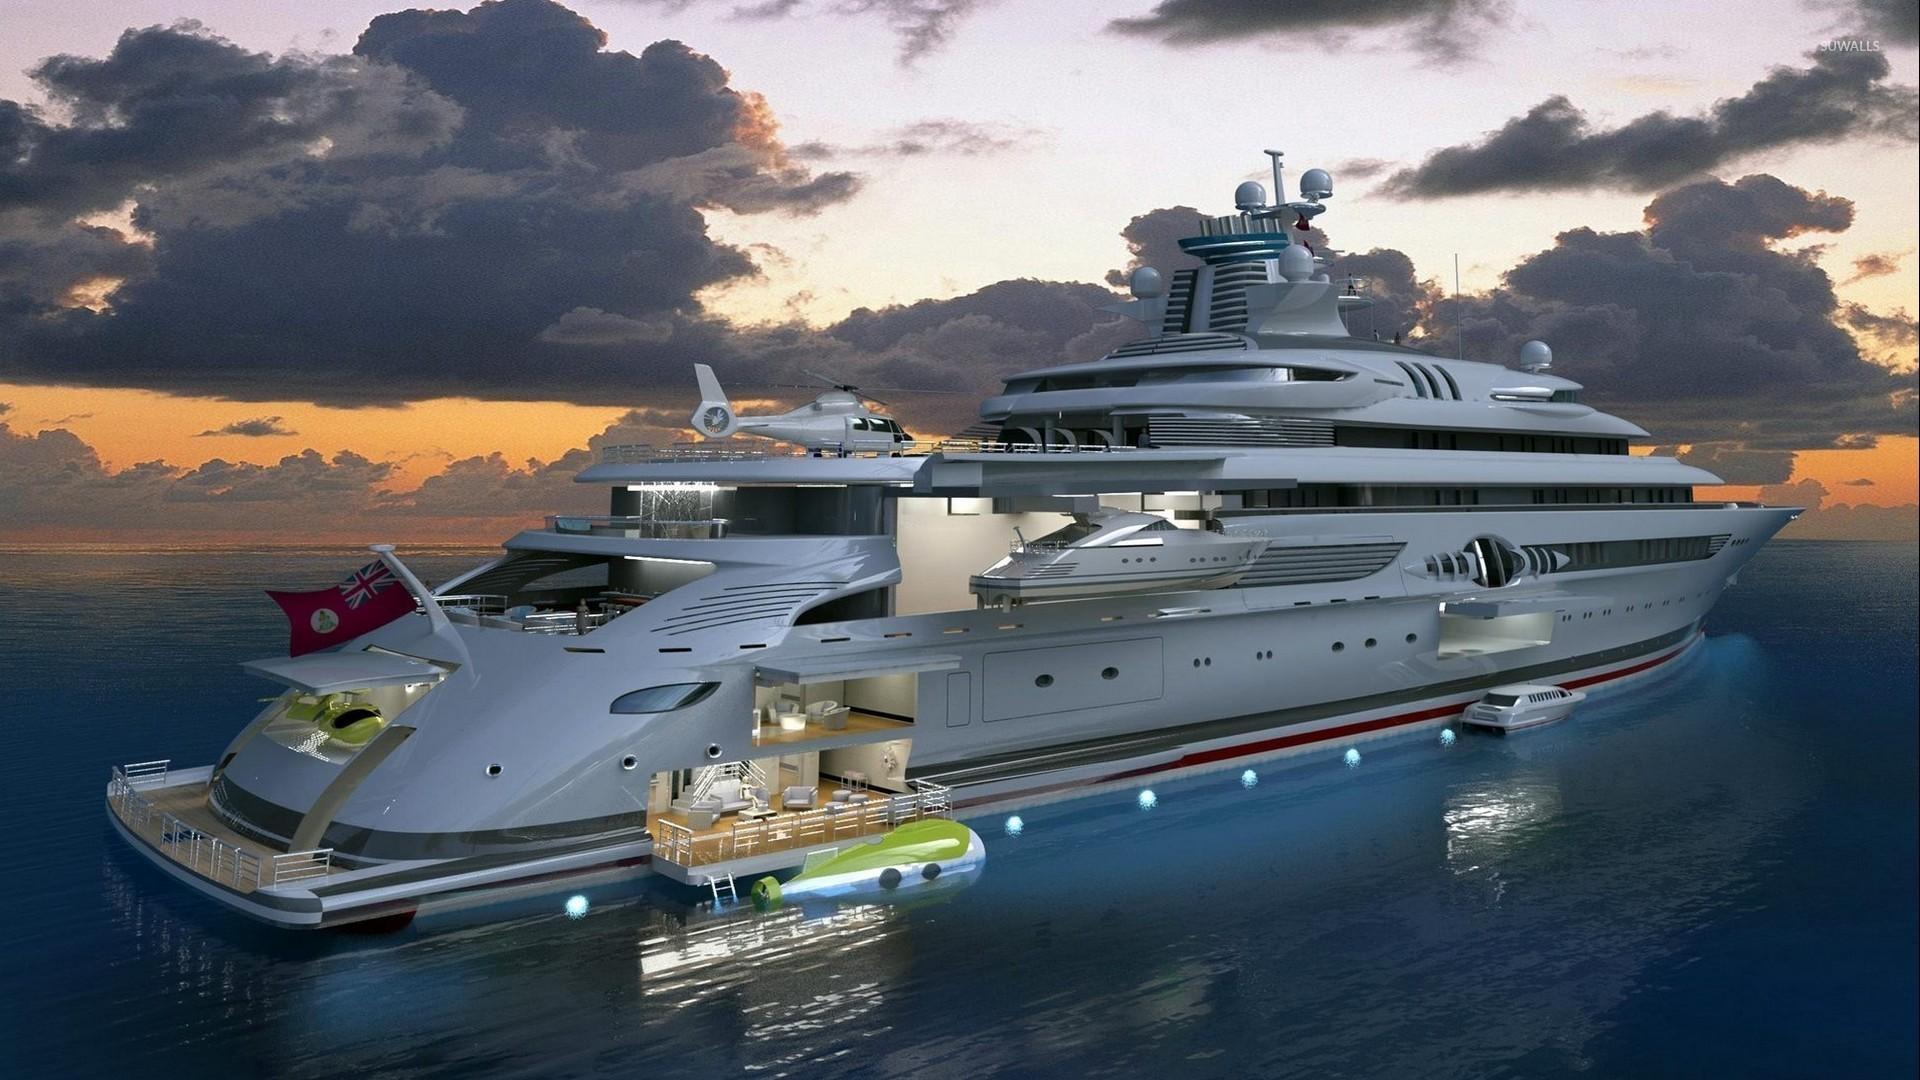 luxury super yacht wallpaper - photo #2